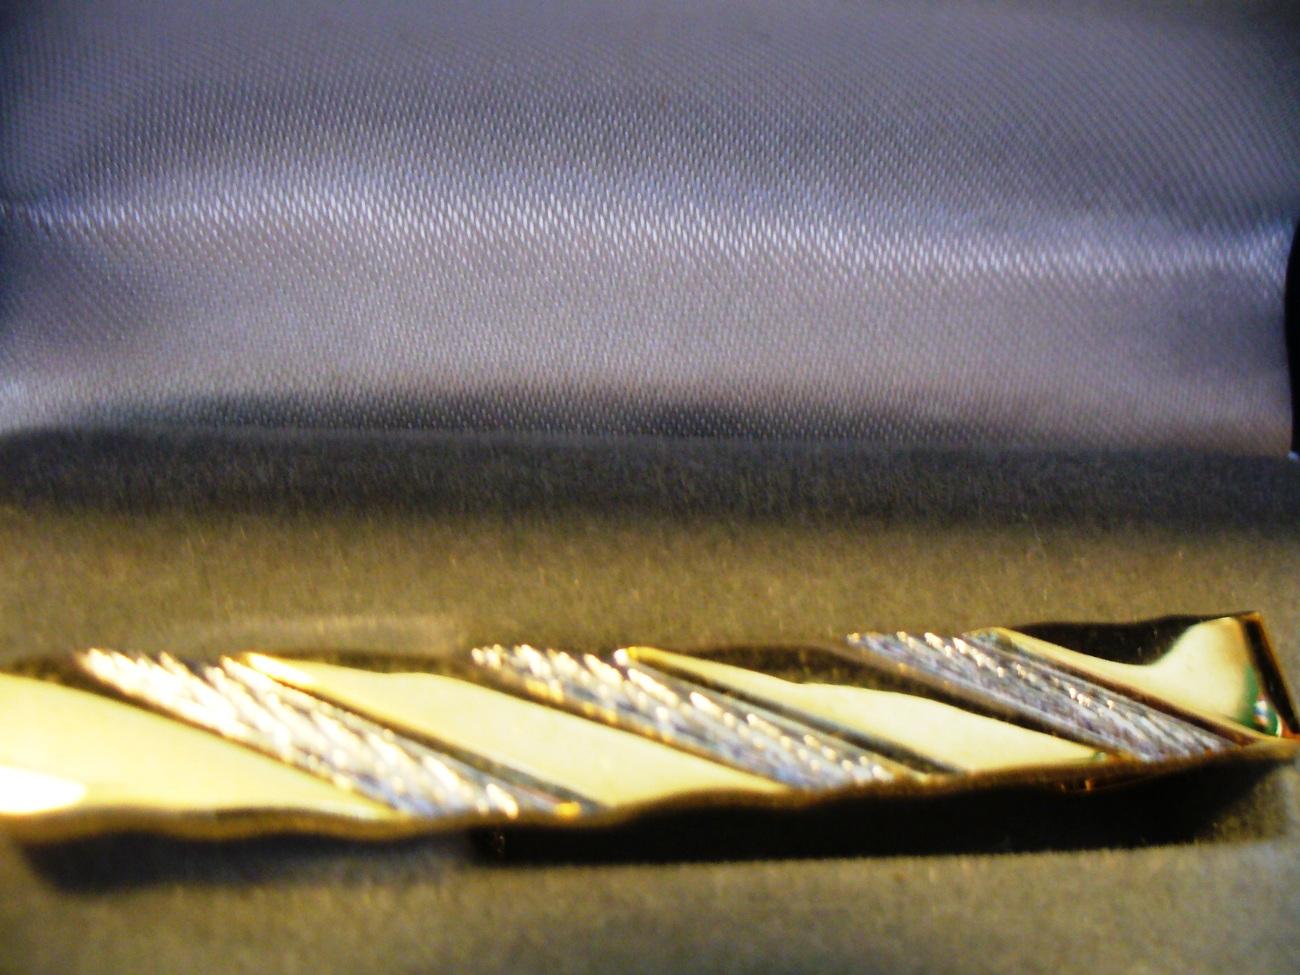 Gold Tone and Silver Stripe Tie Clasp